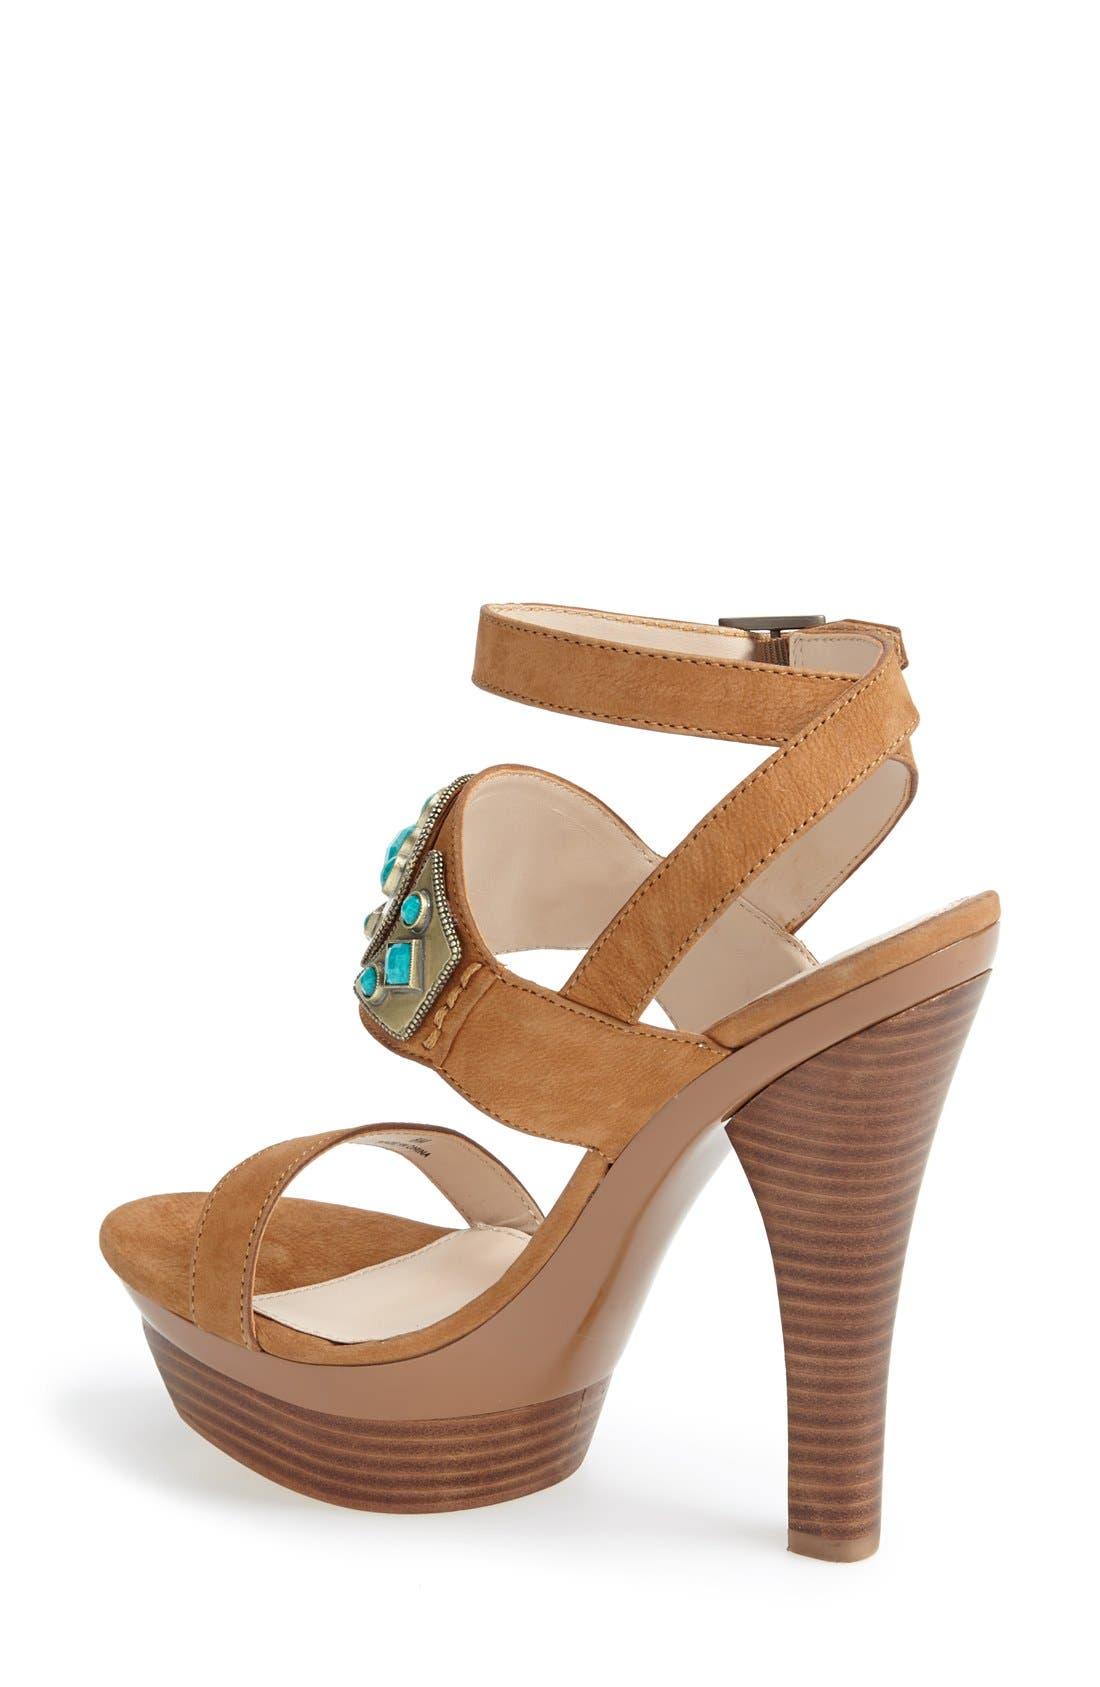 Alternate Image 2  - Pelle Moda 'Cian' Jeweled Leather Ankle Strap Platform Sandal (Women)